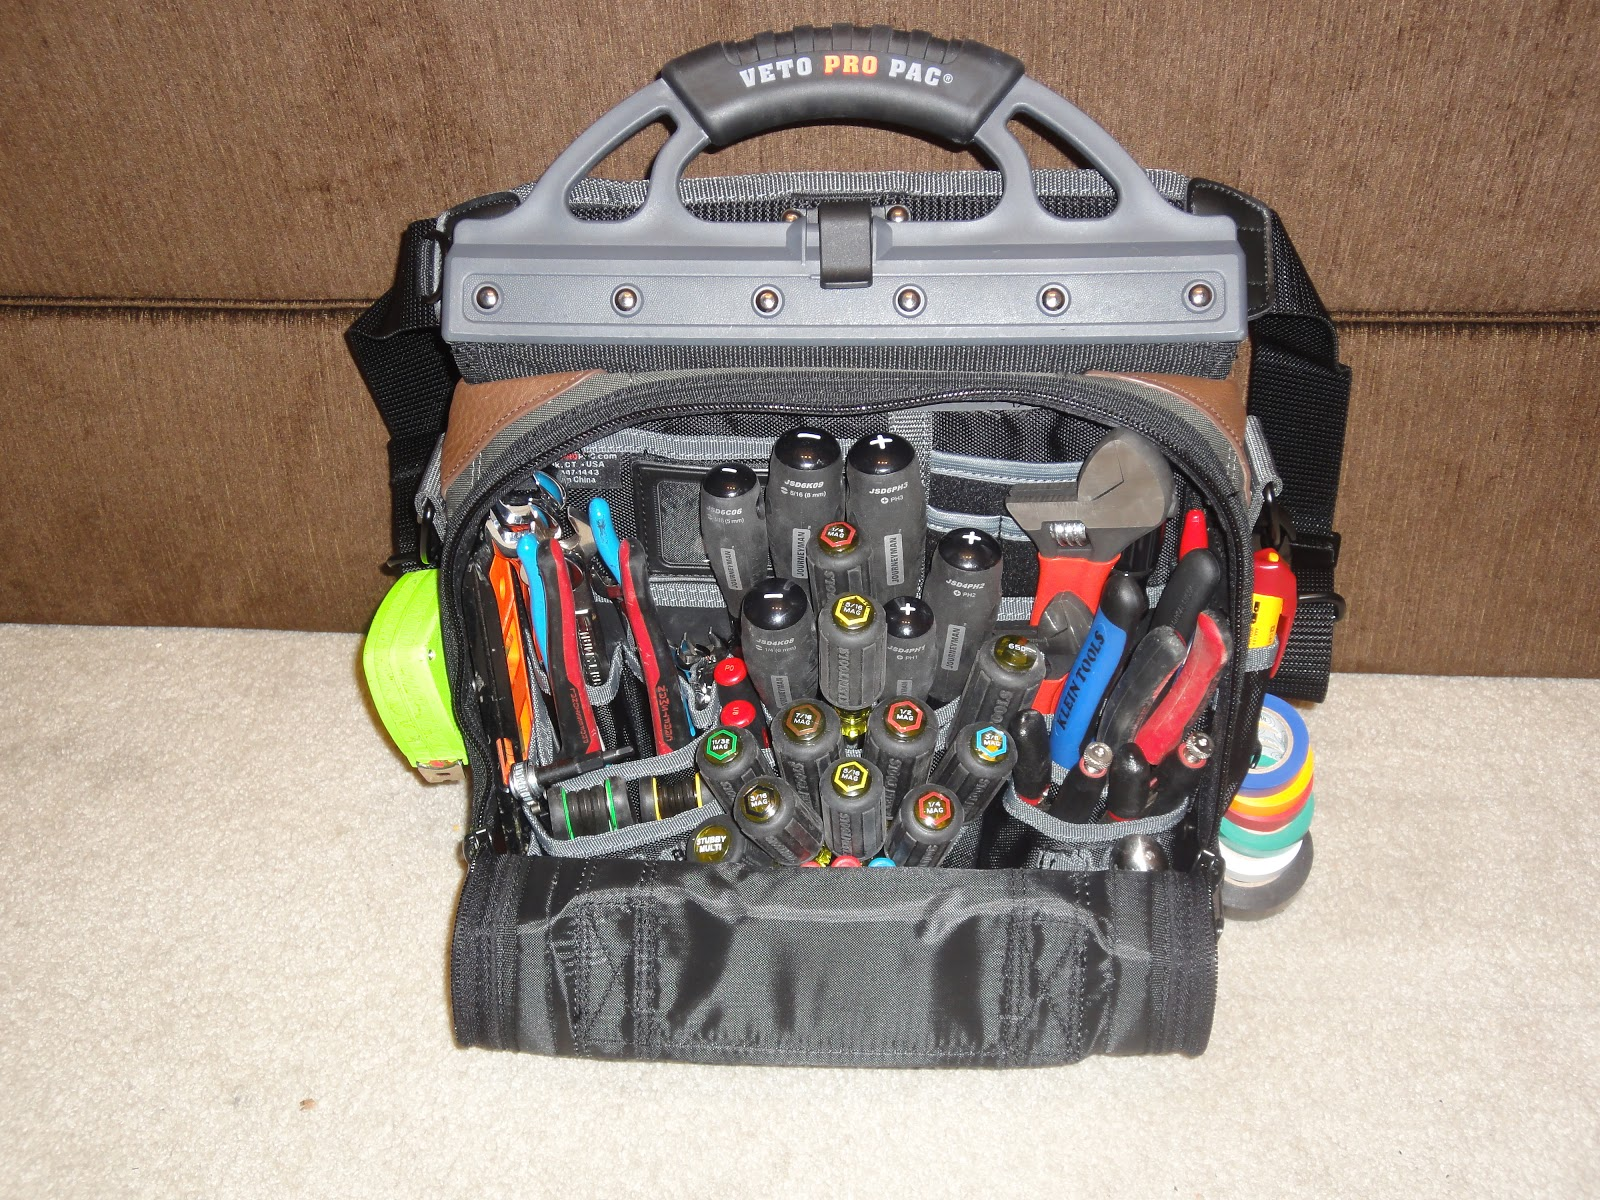 HVAC Student s Tool Bag - Veto Pro Pac Tech LC.